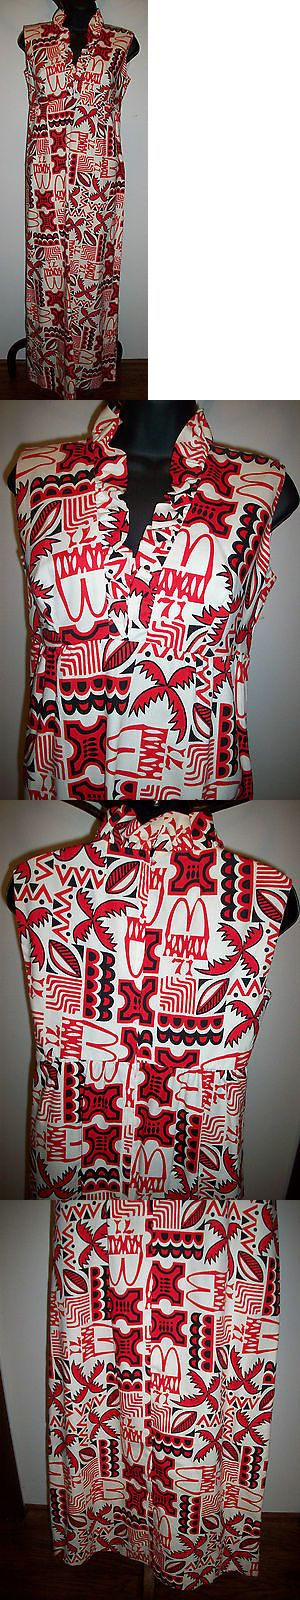 Halloween Costumes Women: Vintage Mcdonalds Employee Uniform Hawaii Dress New Size 10 Halloween Costume BUY IT NOW ONLY: $99.0